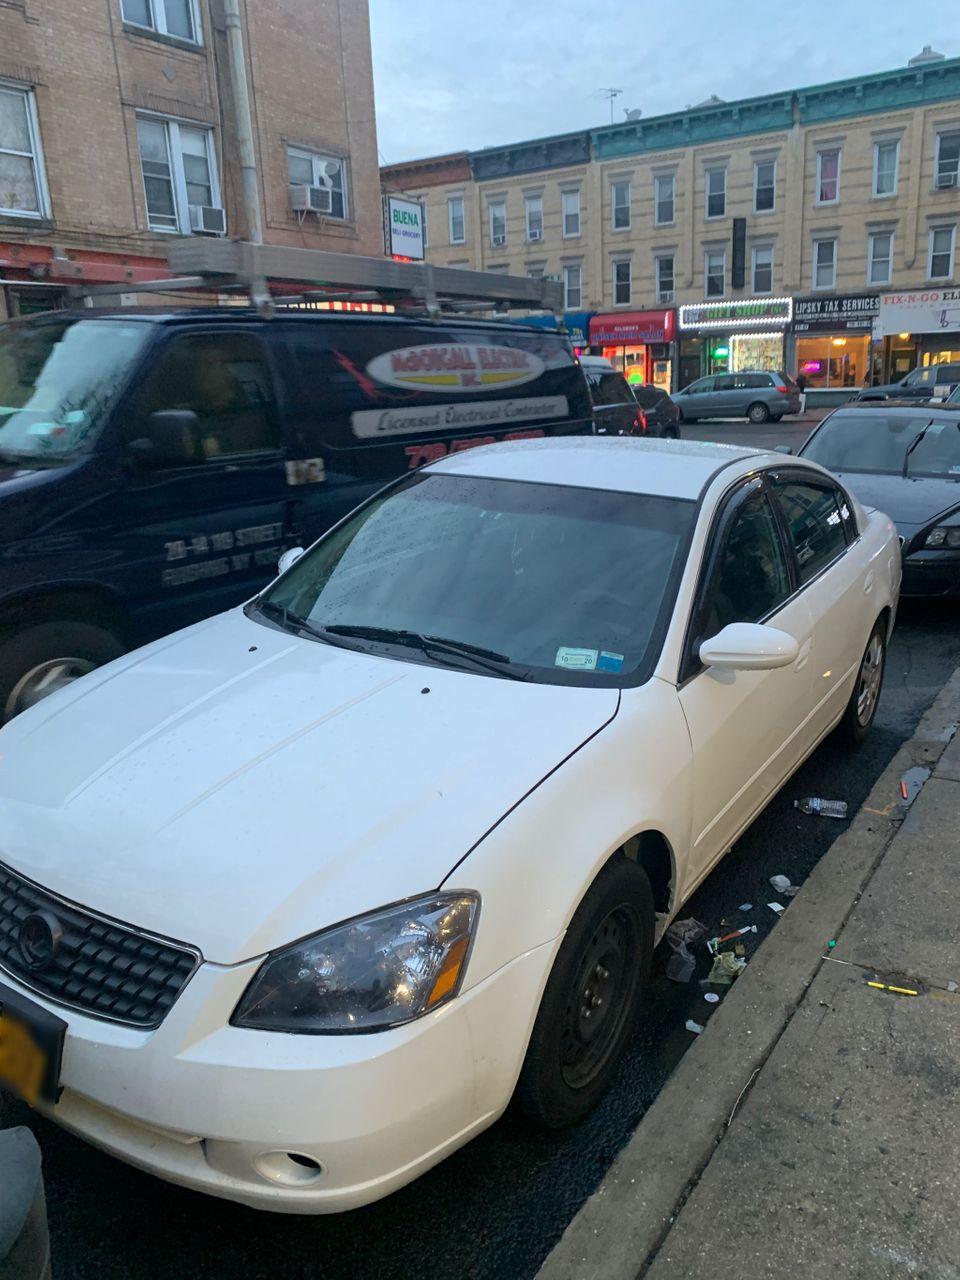 2006 Nissan Altima | Maspeth, NY, Satin White Pearl (White), Front Wheel